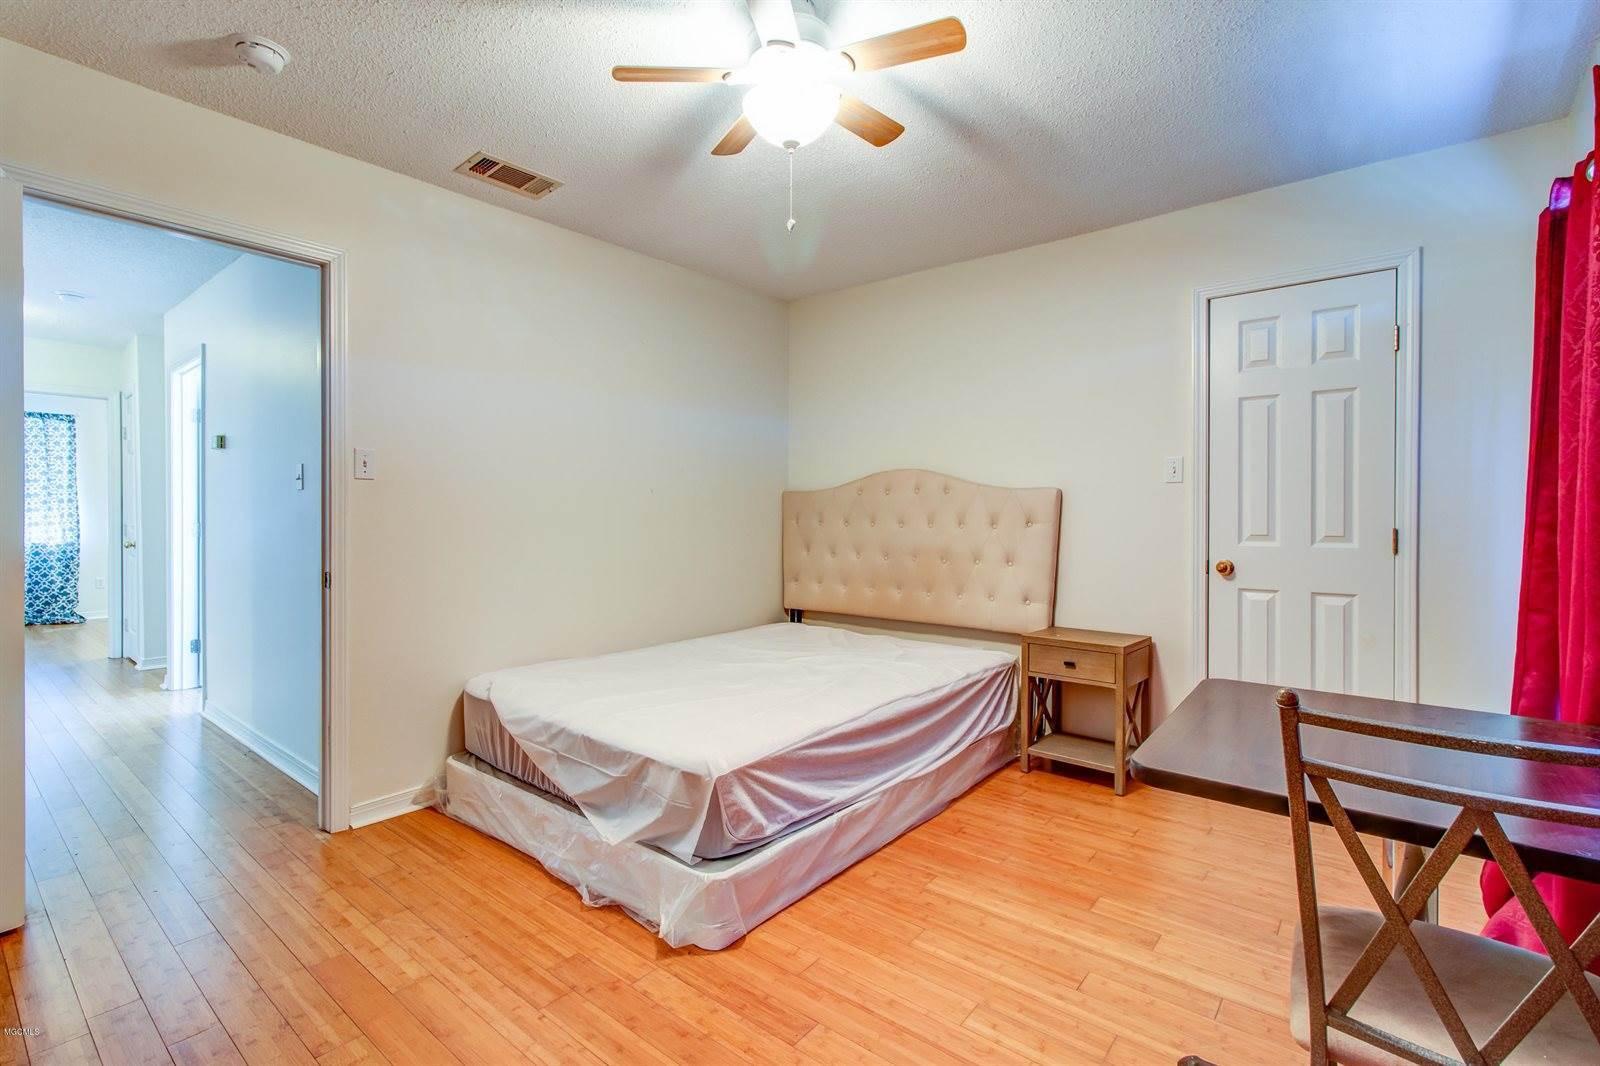 2248 Club Moss Cir, Biloxi, MS 39532